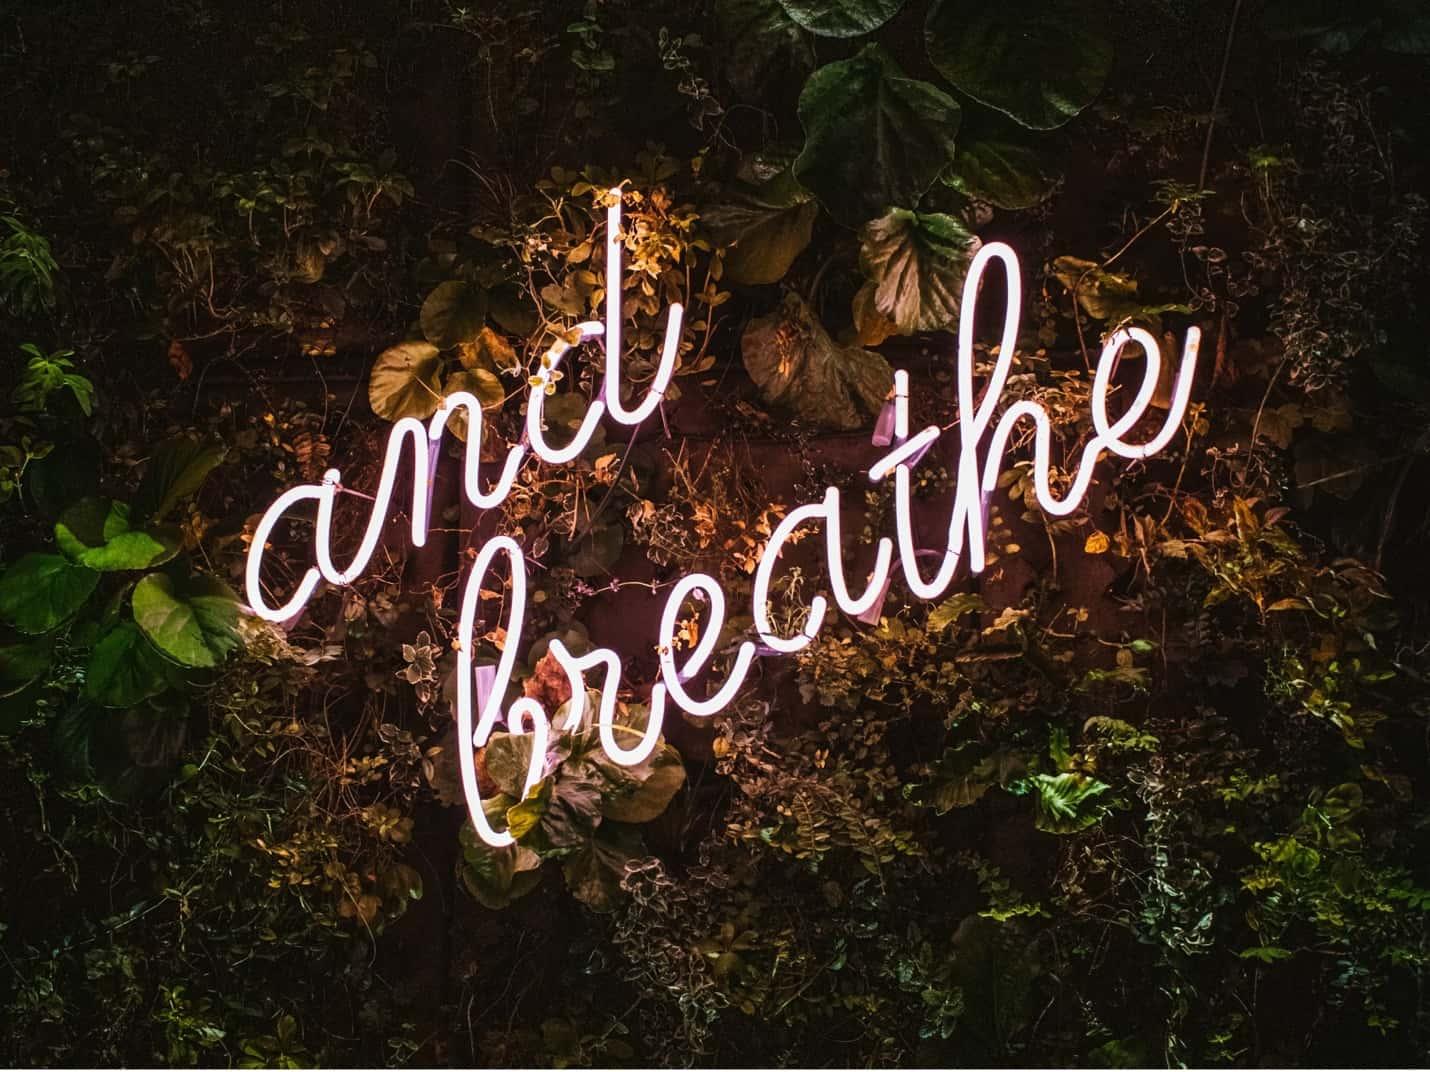 Taking a deep breath will help you battle creative block.